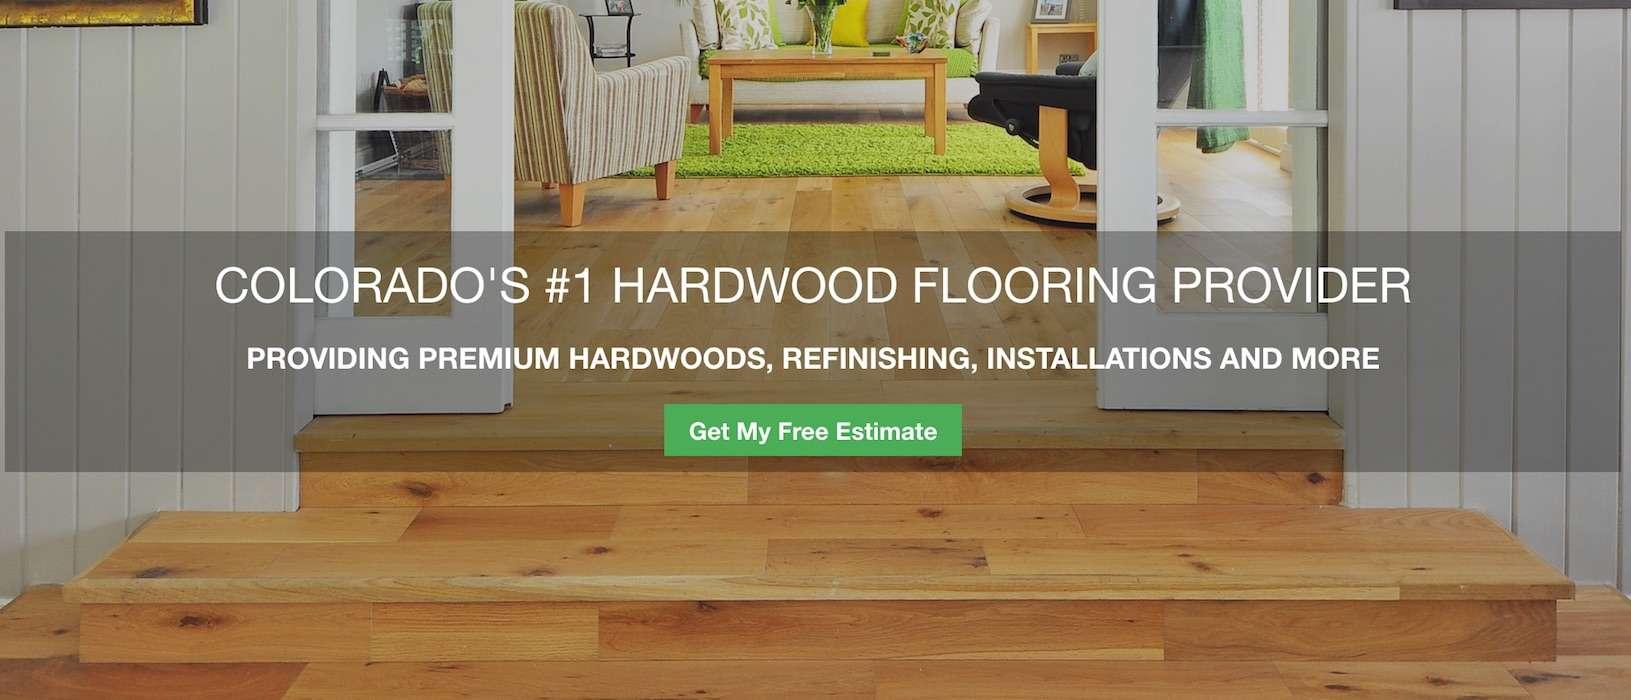 Element Hardwood Flooring | Refinishing, Installations, Repairs, & More